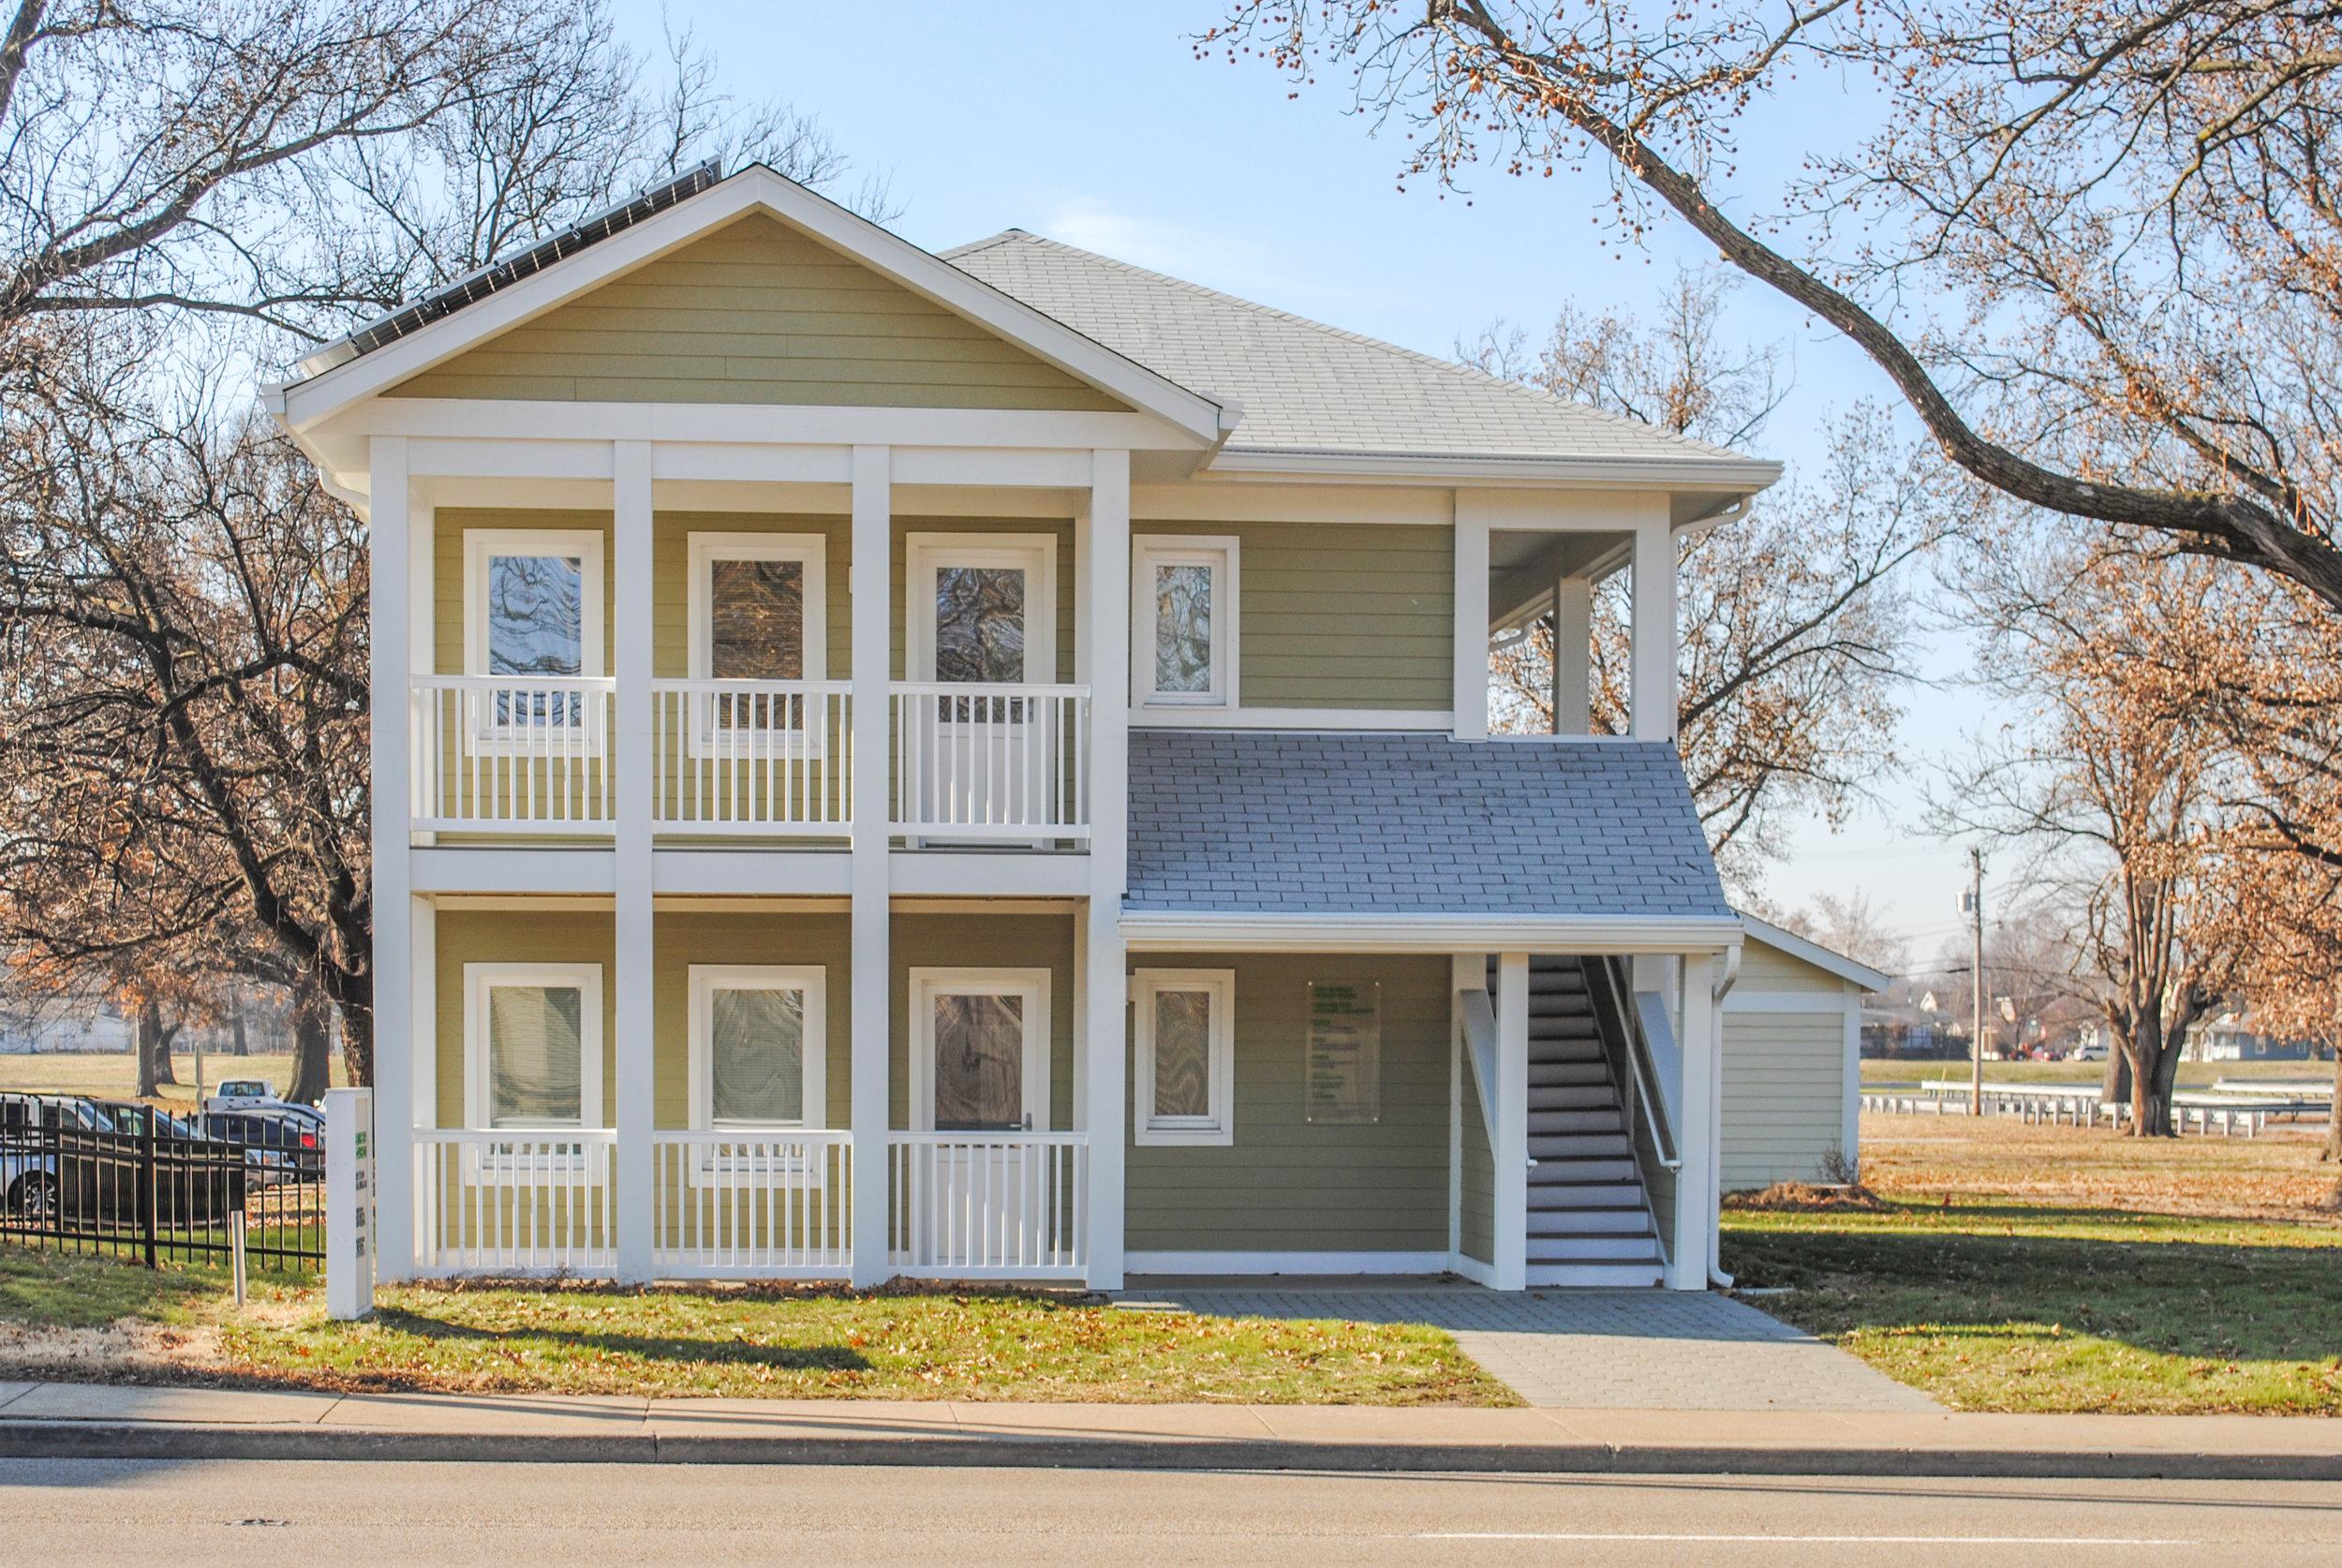 Granite City Passive House | Granite City Housing Authority - Granite City, IL